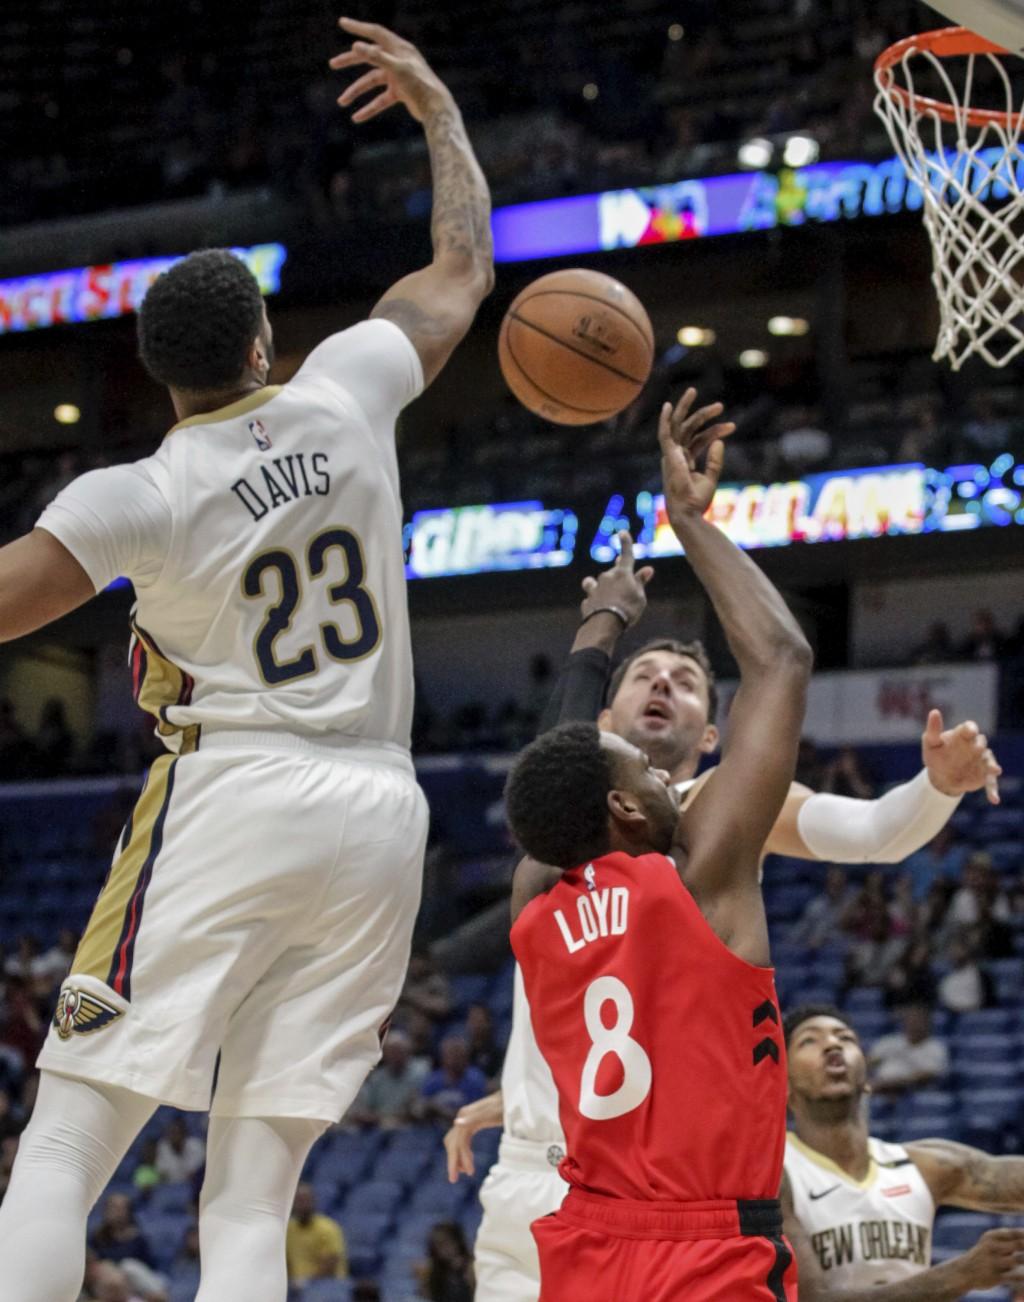 New Orleans Pelicans forward Anthony Davis (23) blocks a shot by Toronto Raptors guard Jordan Loyd (8) during the first half of a preseason NBA basket